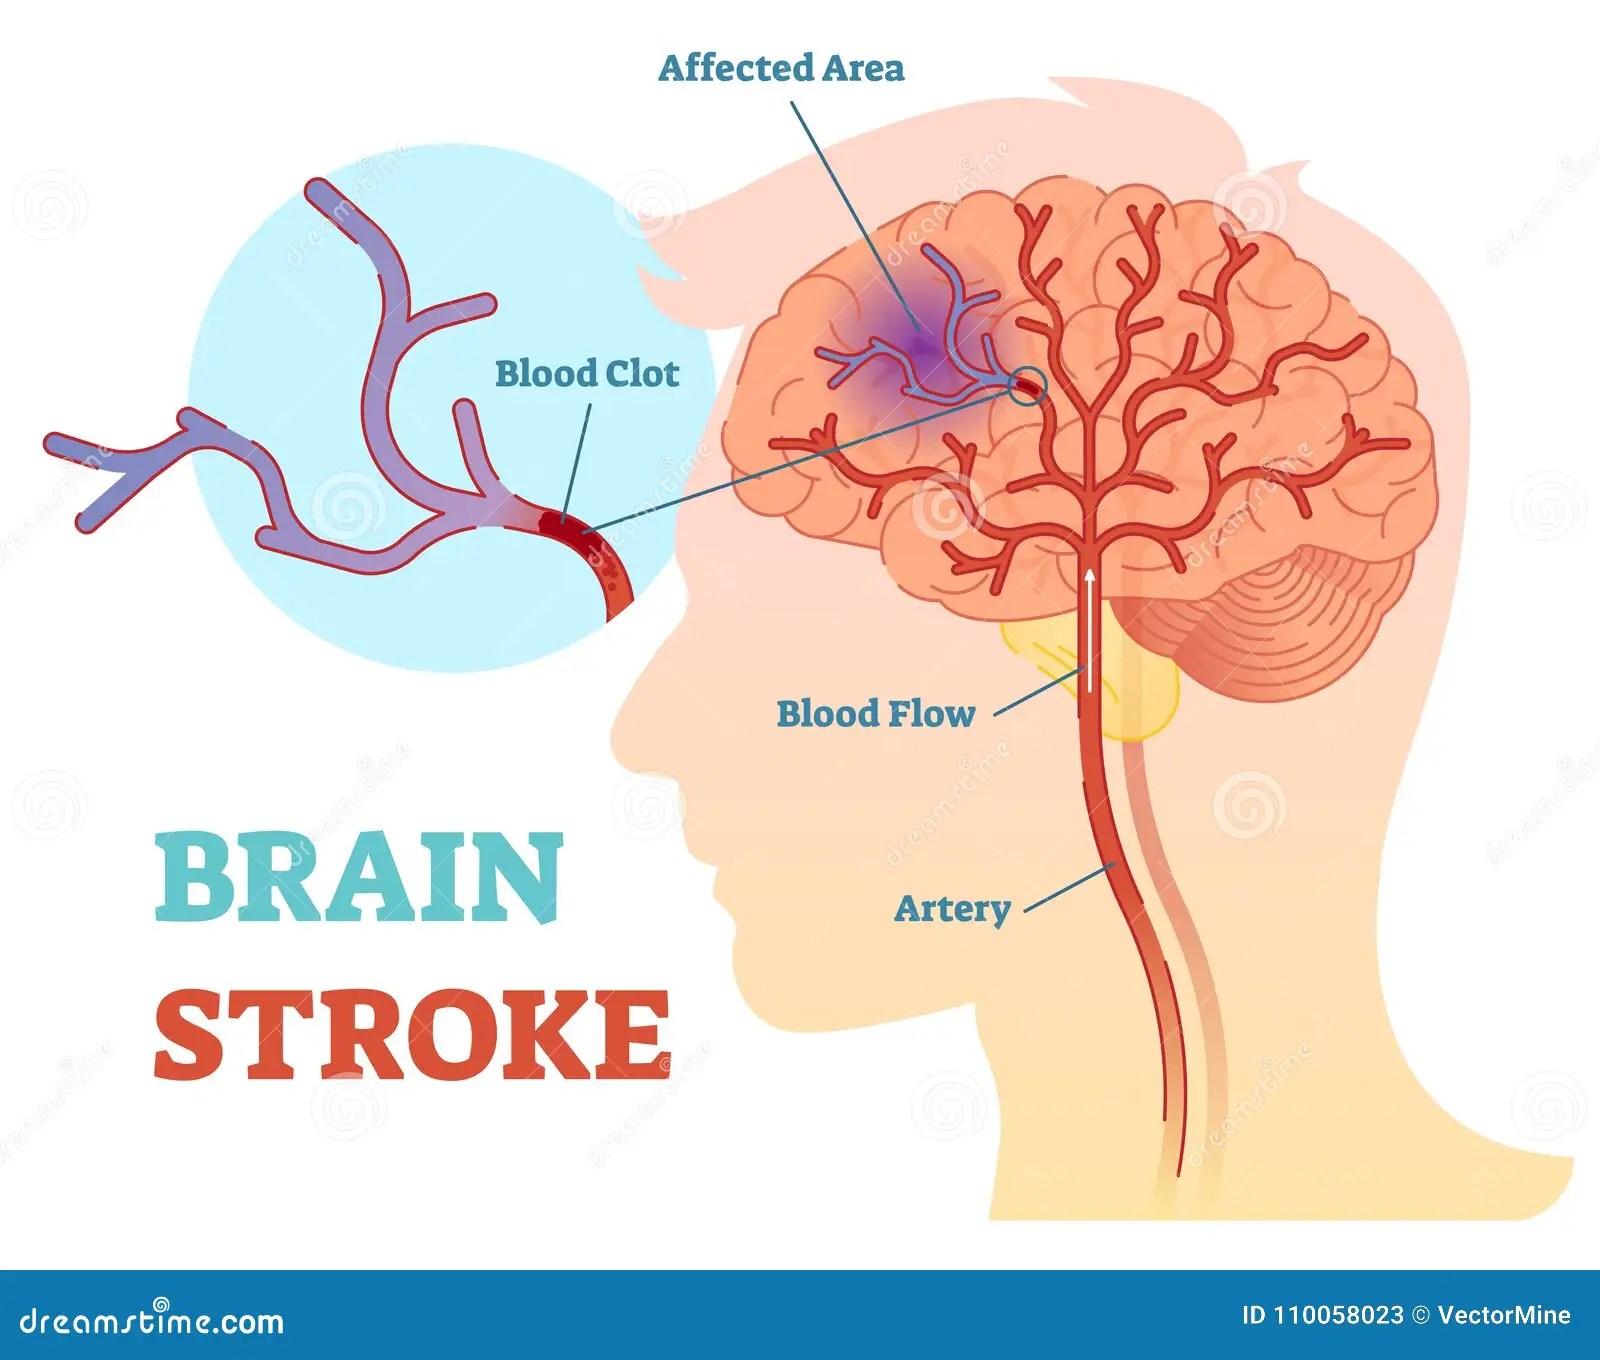 hight resolution of brain stroke anatomical vector illustration diagram scheme